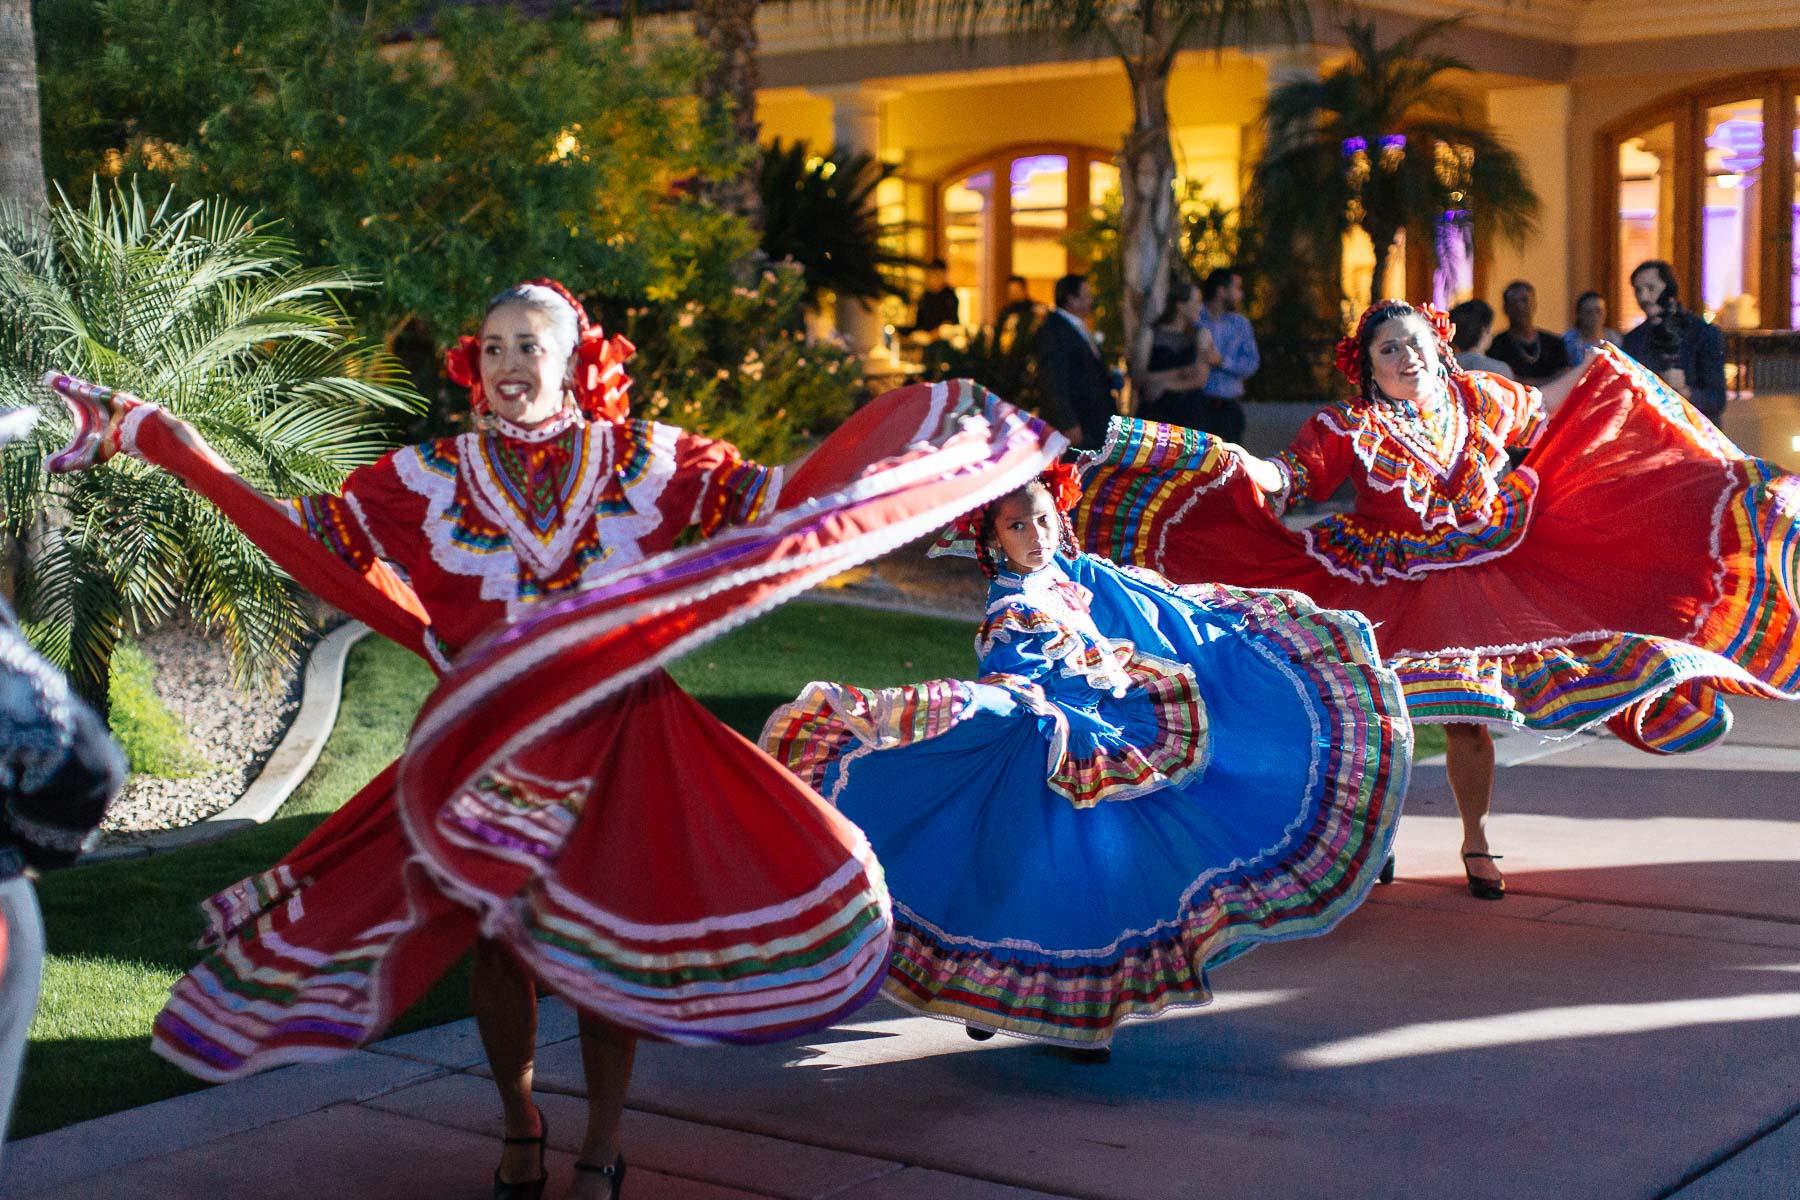 161029-Luxium-Weddings-Arizona-Jeff-Griselda-First-Look-Val-Vista-Lakes-Gilber-074.jpg